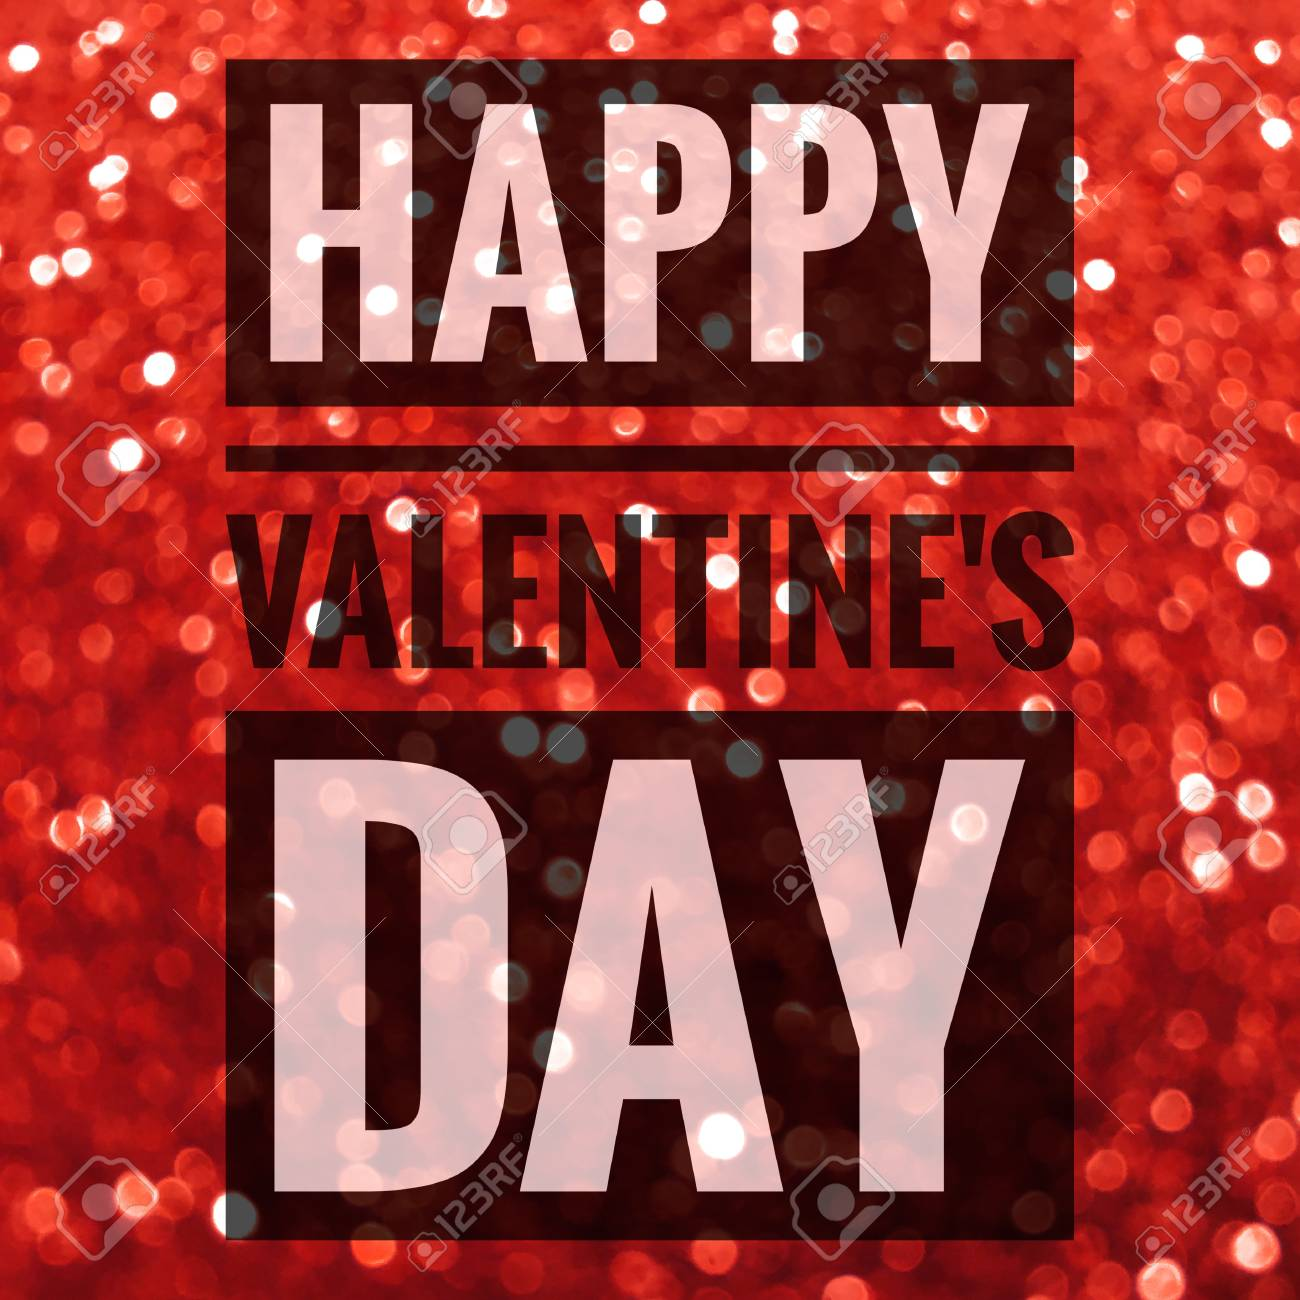 Happy Valentine S Day Words On Shiny Red Glitter Background Stock